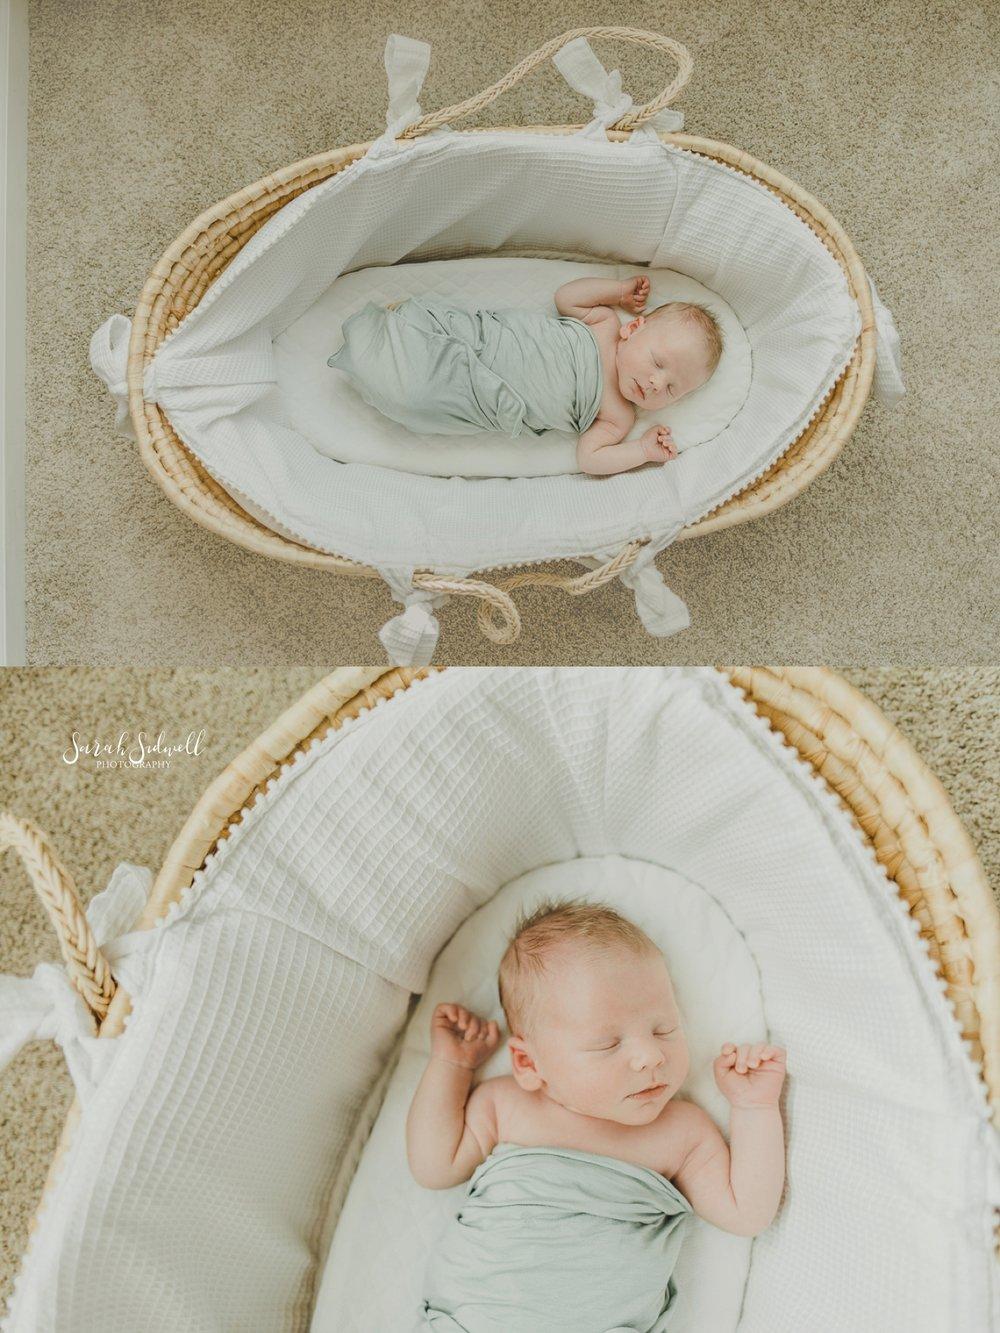 A baby sleeps